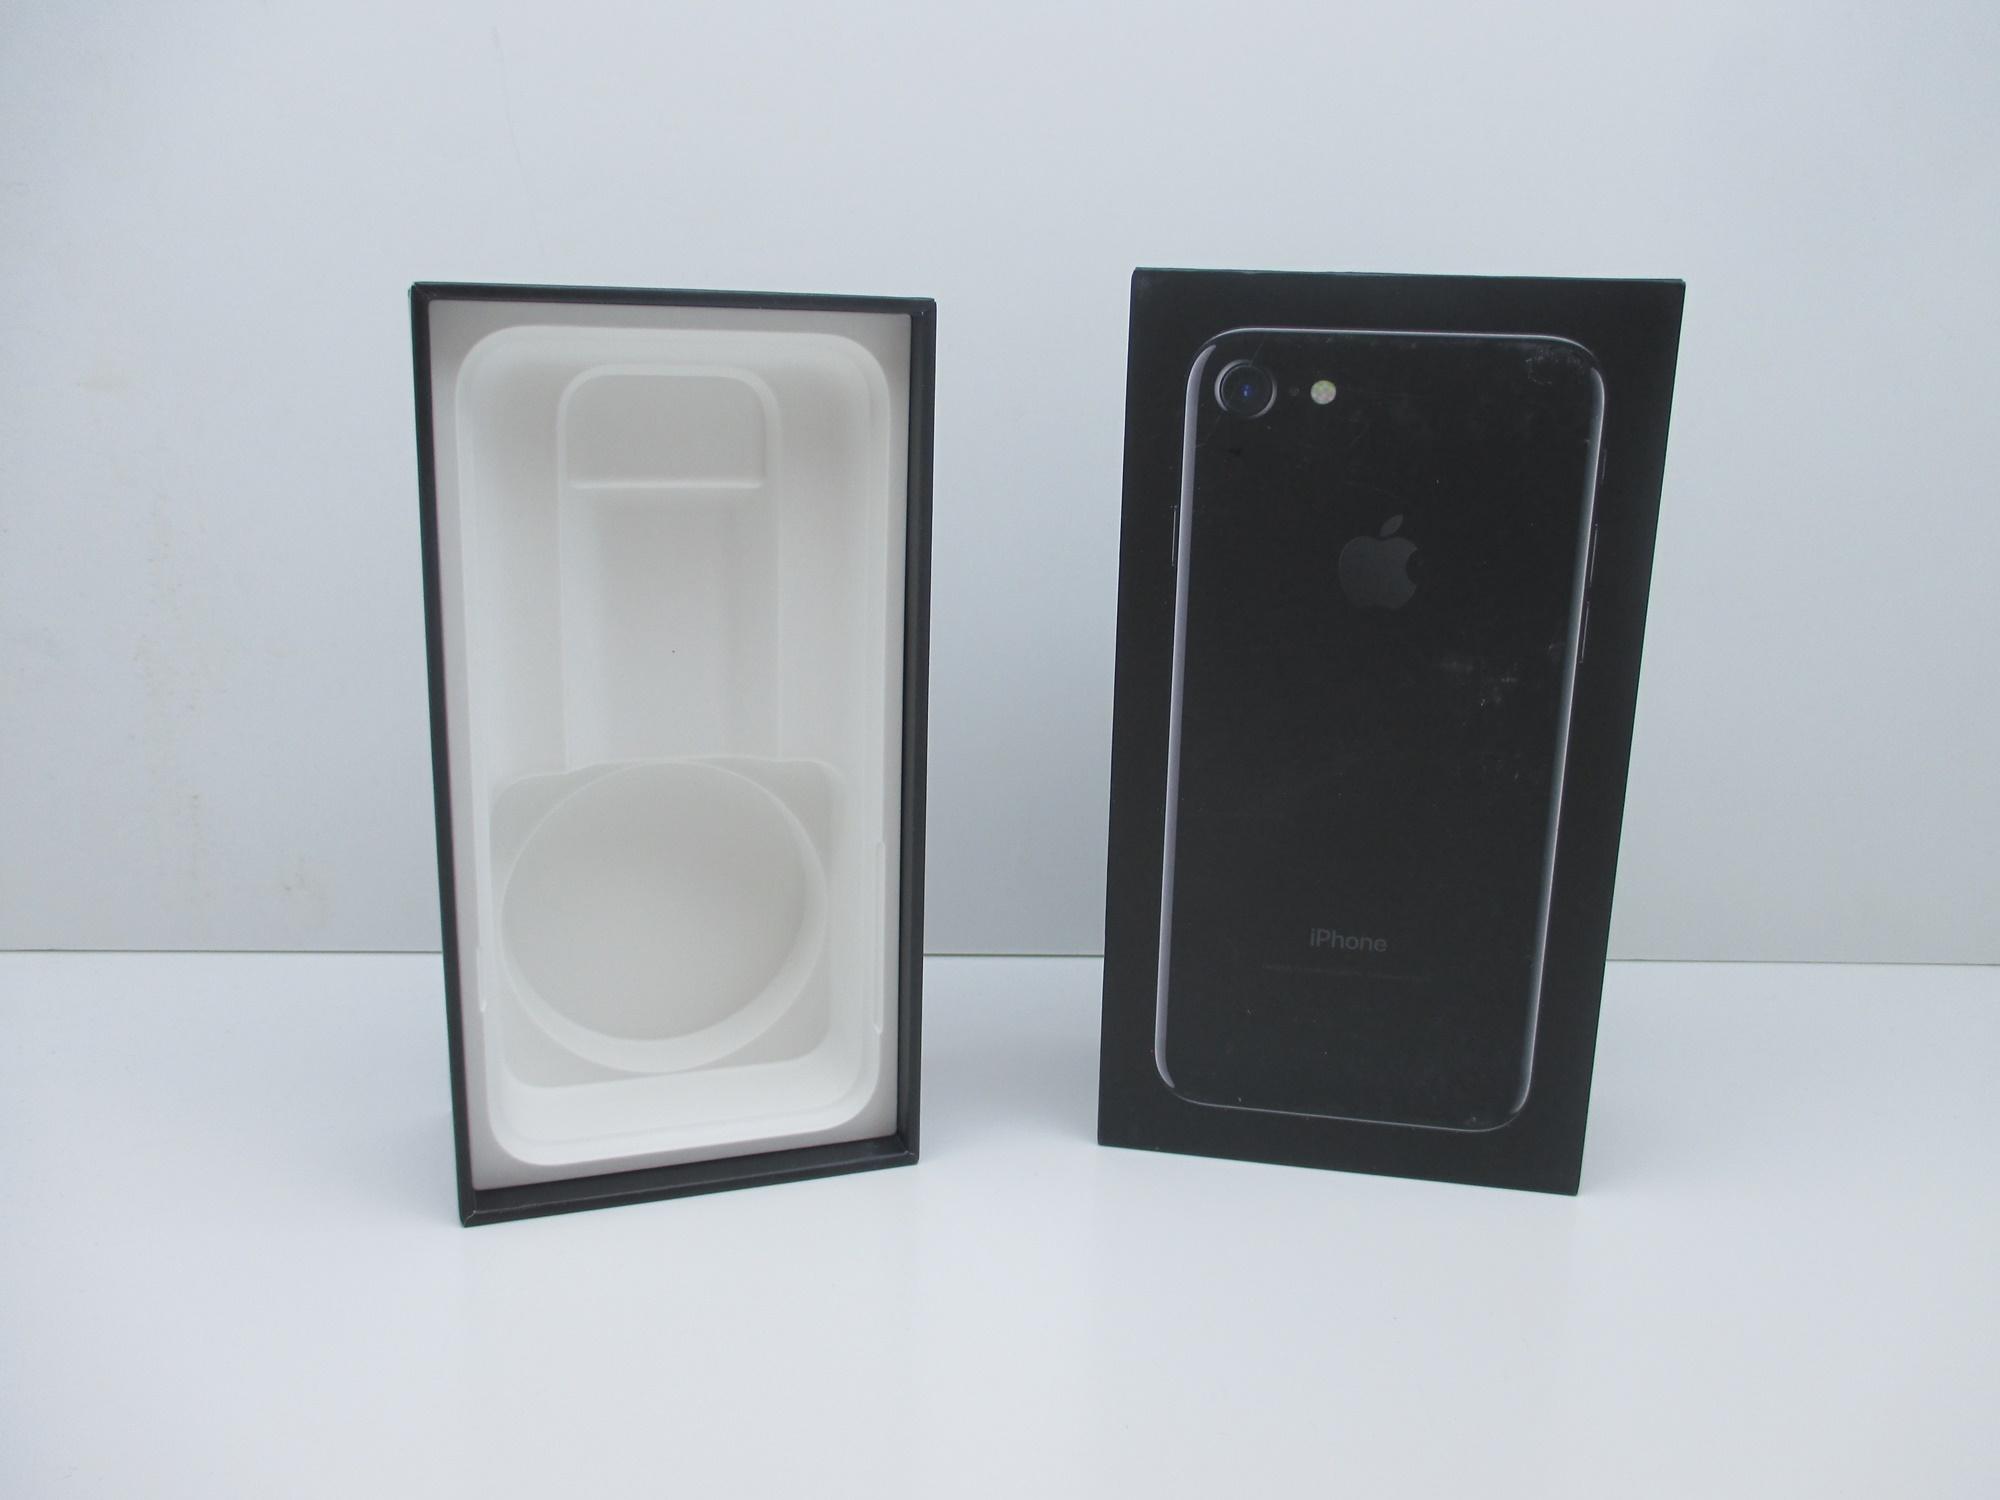 apple iphone 7 verpackung ovp leerkarton jet black 256gb. Black Bedroom Furniture Sets. Home Design Ideas